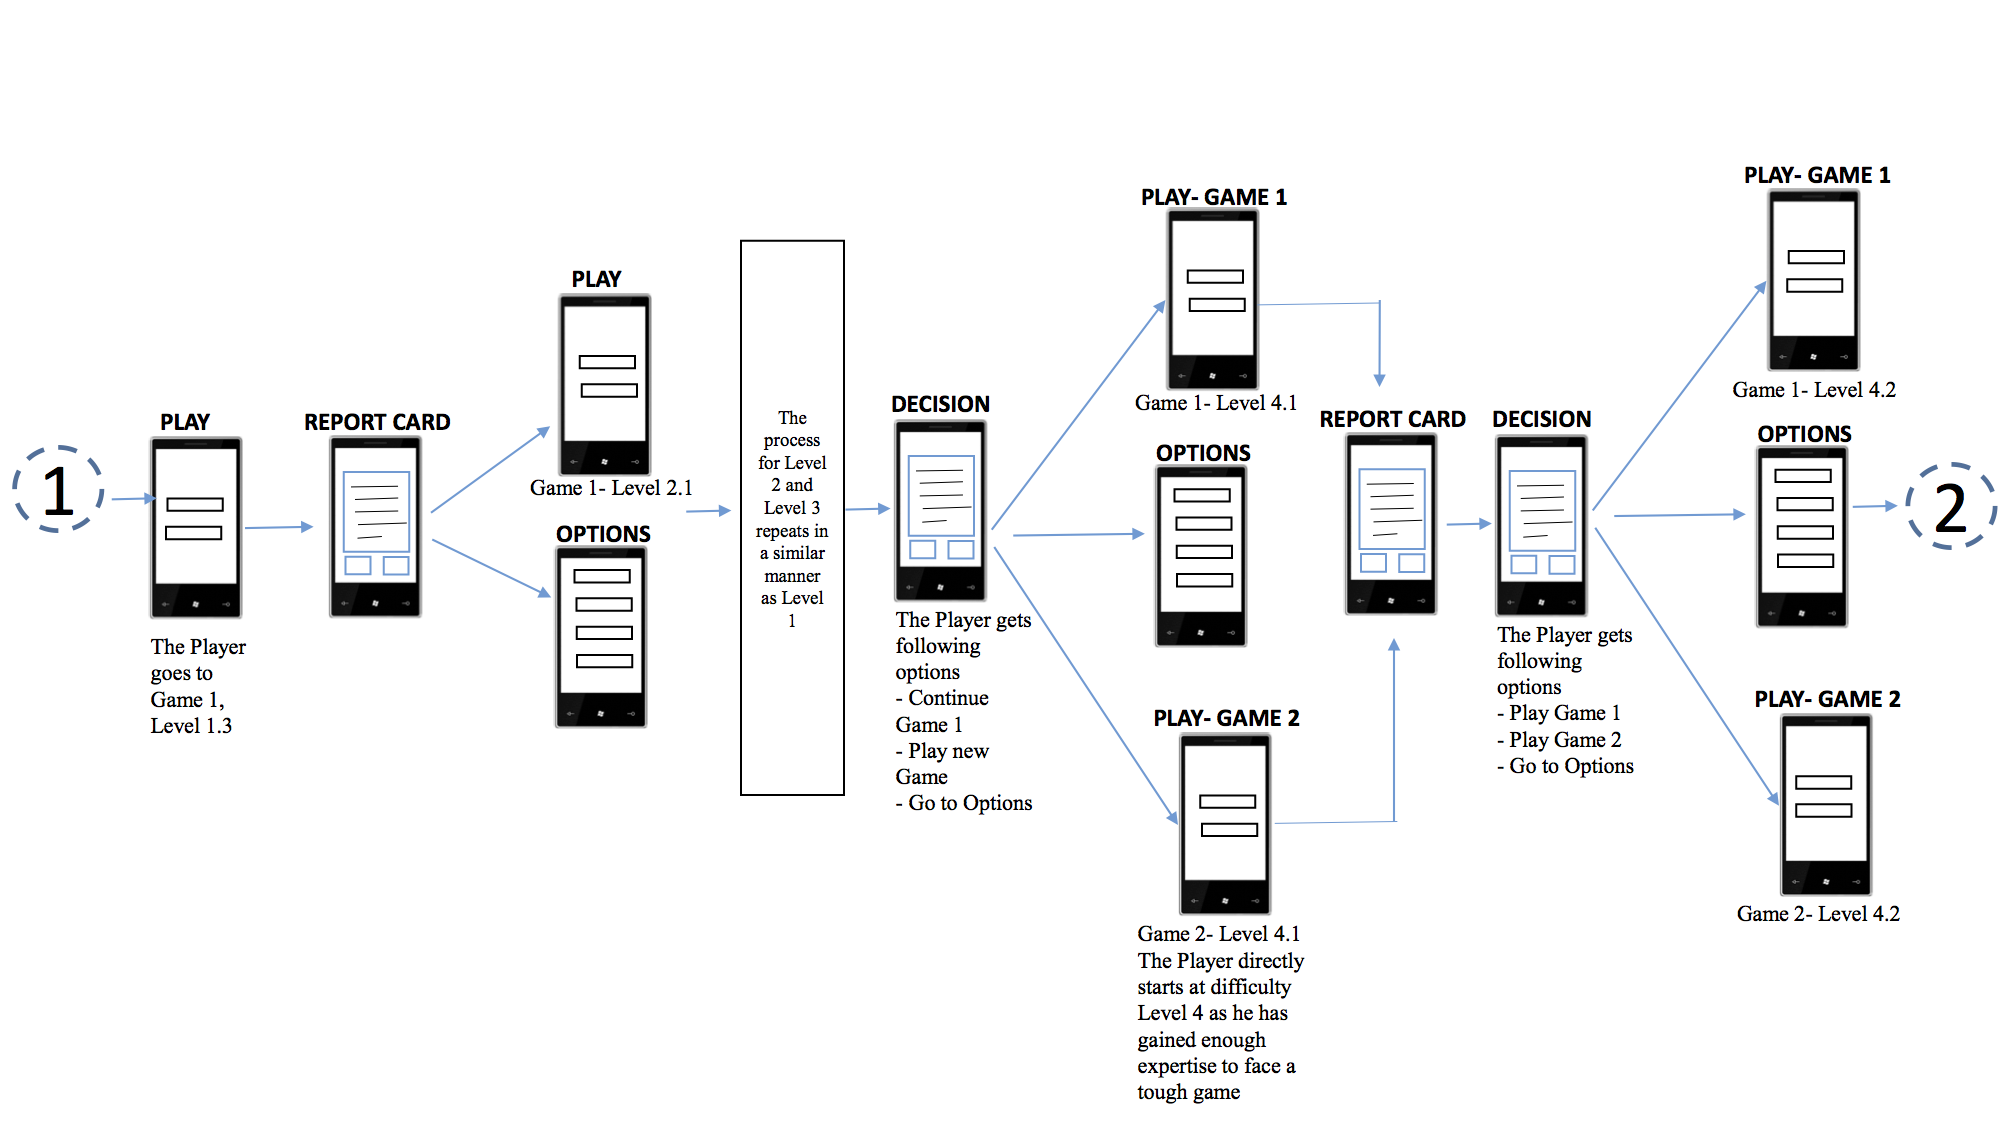 Trashtalk_InformationArchitecture2.png